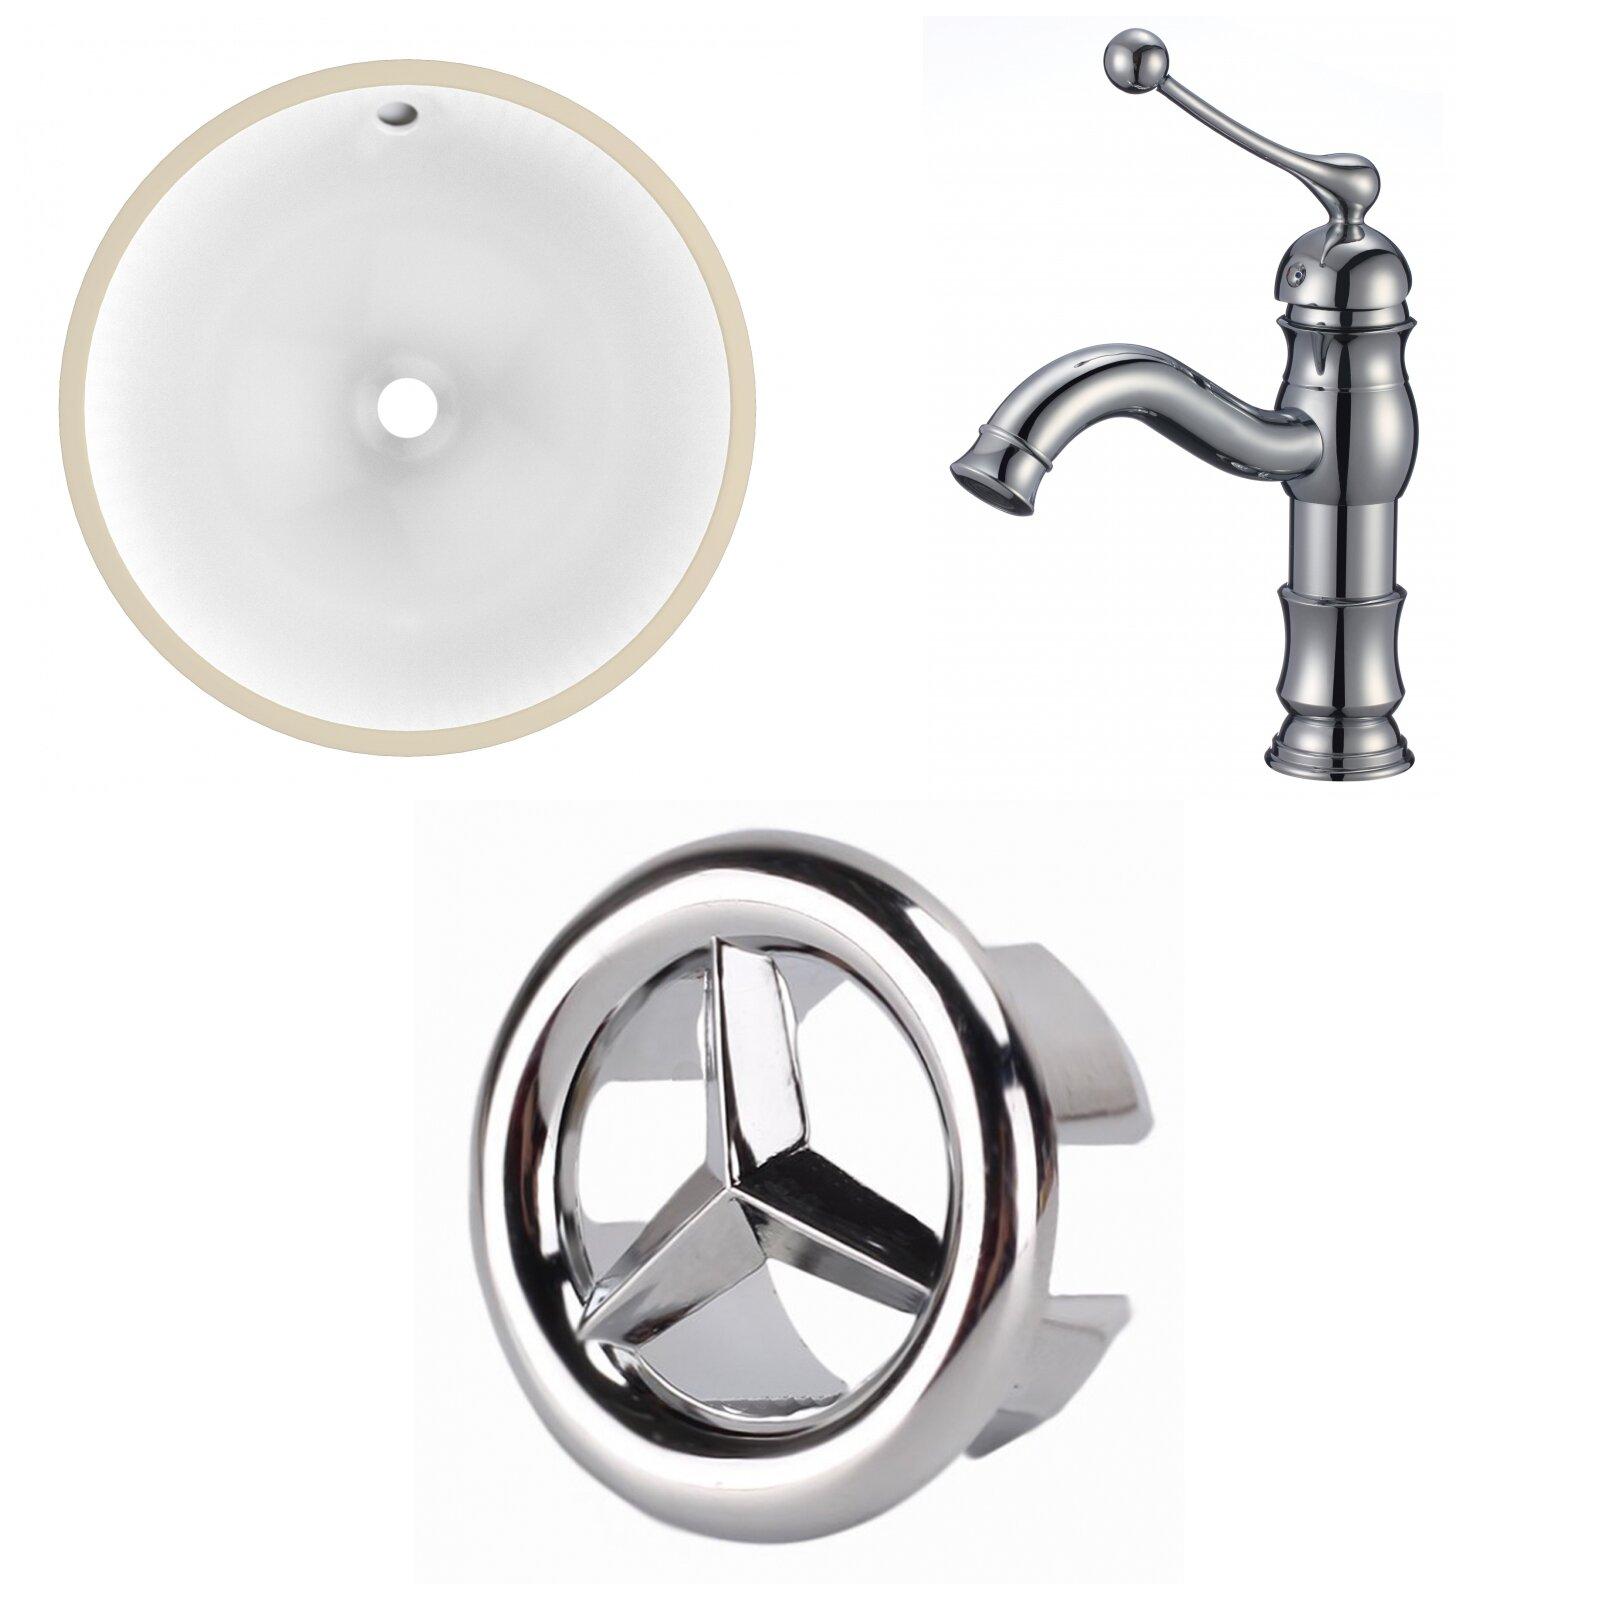 Avanities Ceramic Specialty Undermount Bathroom Sink With Faucet And Overflow Wayfair